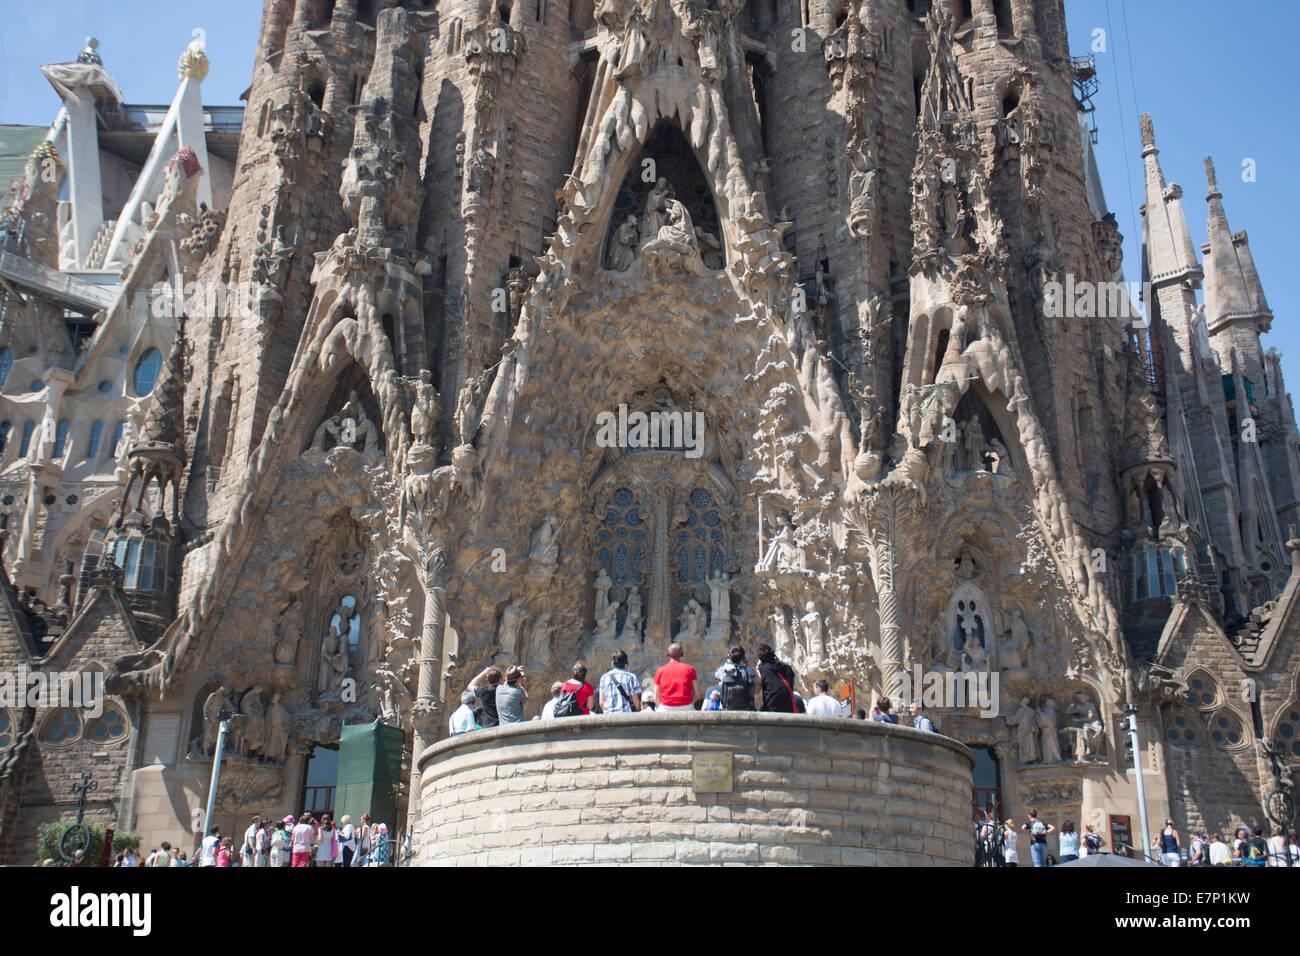 Gaudi World Heritage Architecture Art Barcelona Catalonia Colourful Famous Sagrada Familia Skyline Spain Europe Tour